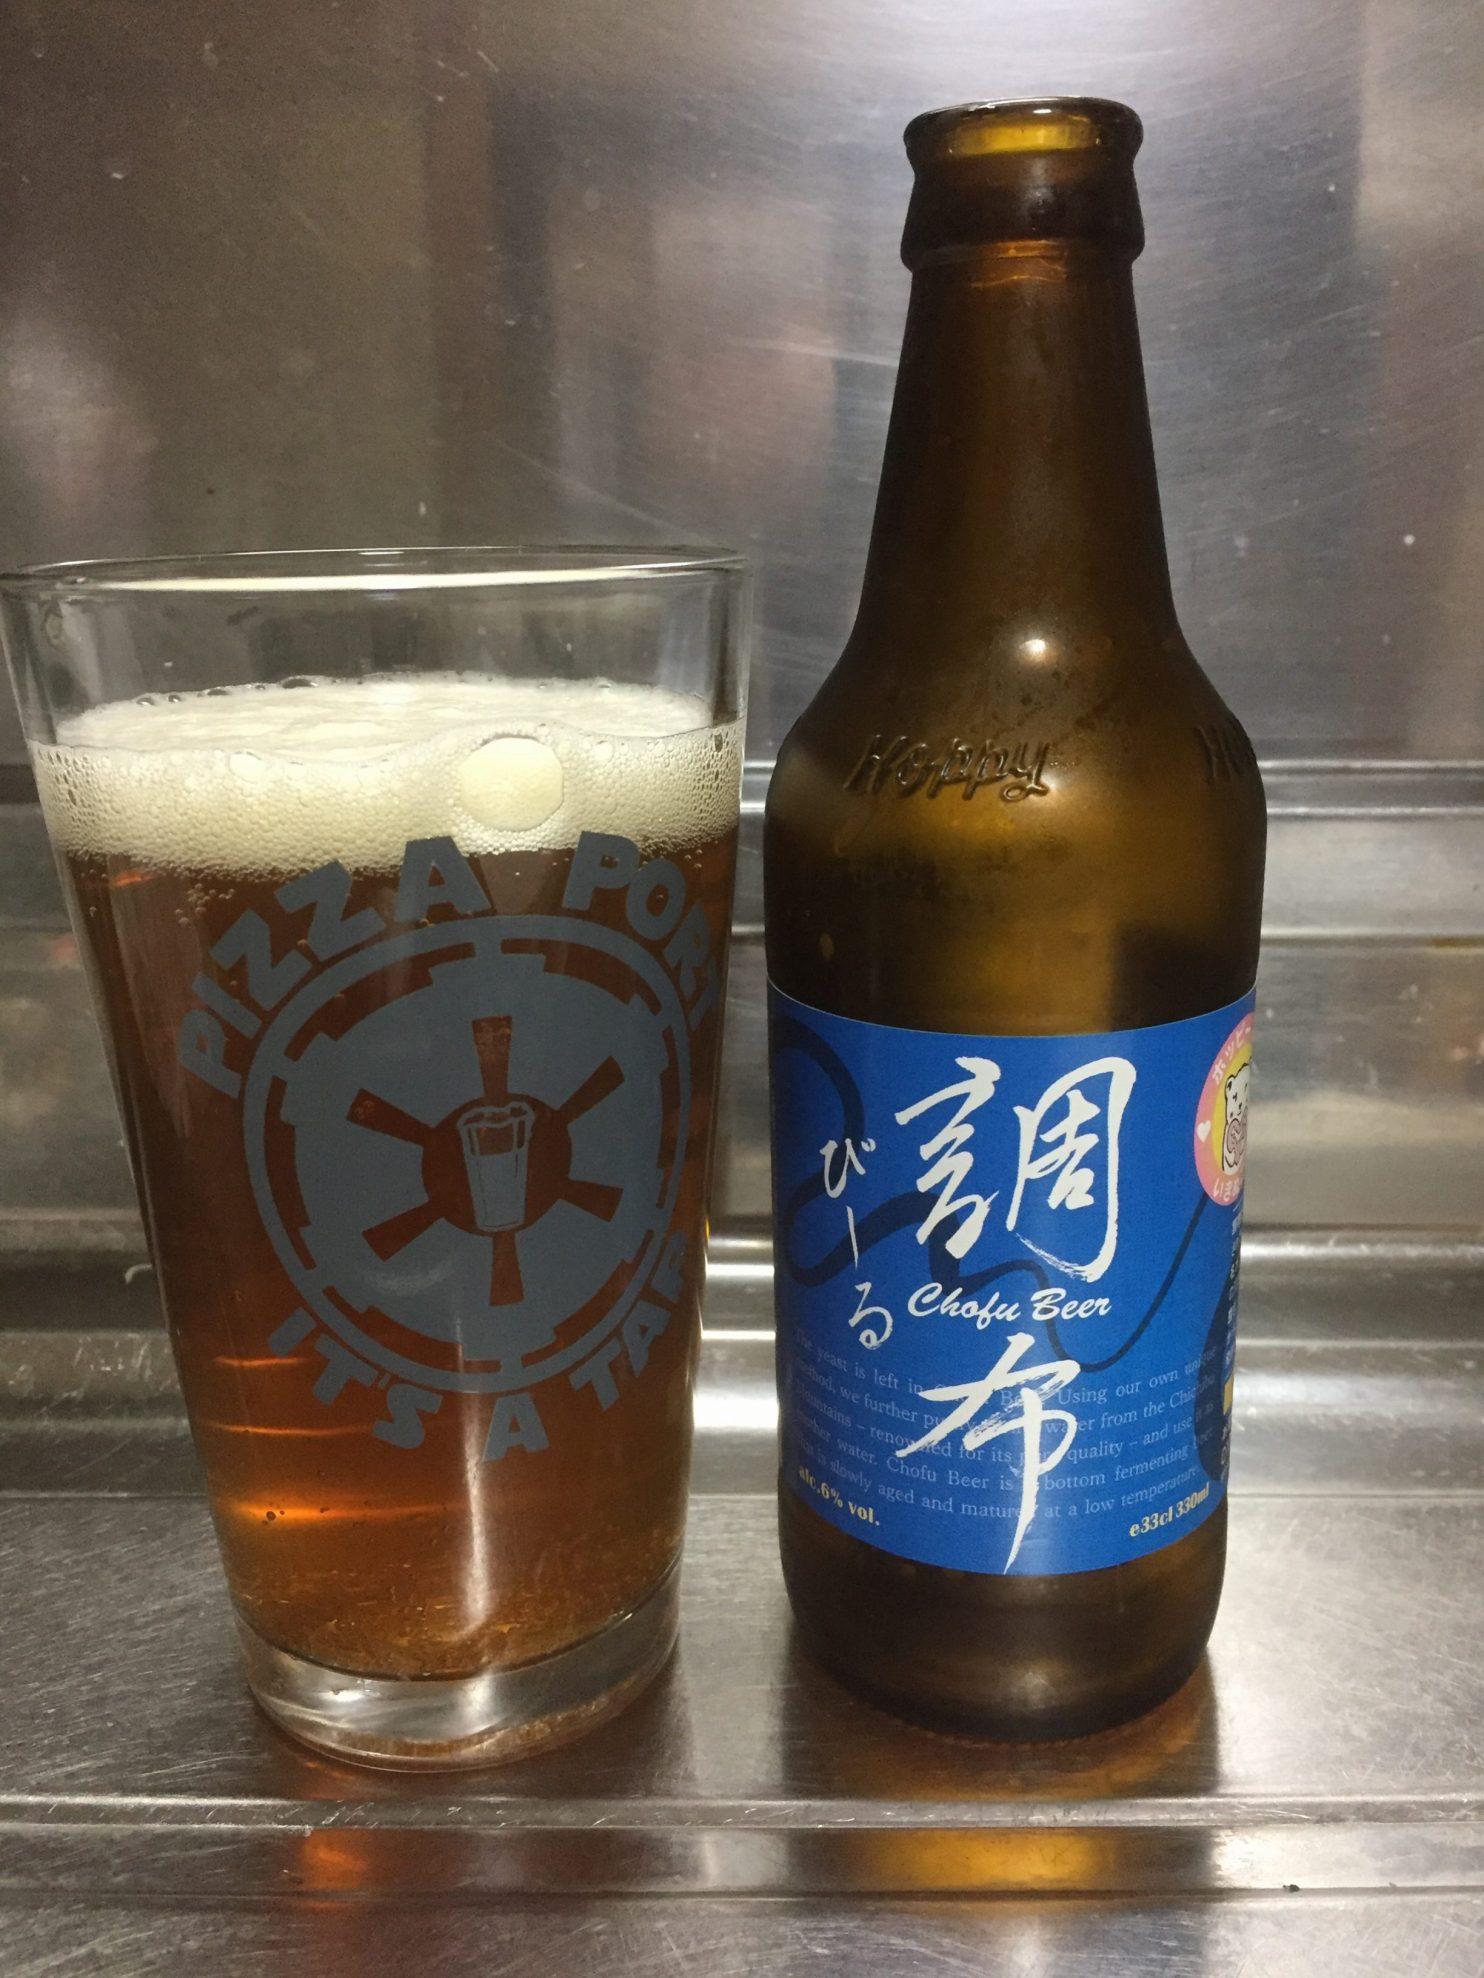 Chofu Beer by Hoppy Beverage Co. / ホッピービバレッジの調布びーる